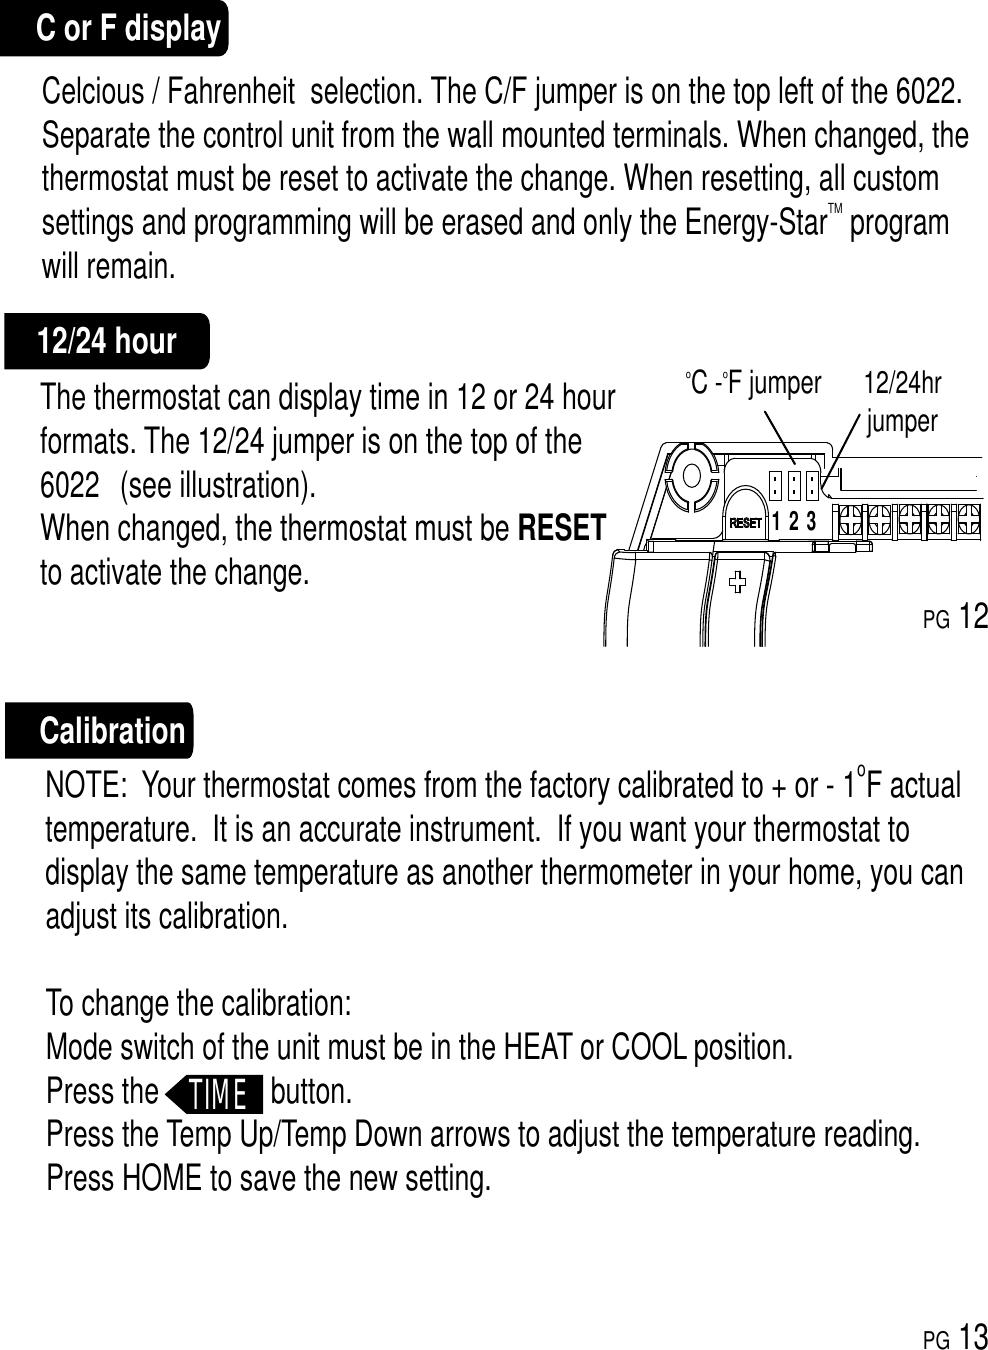 honda pioneer 700 owners manual